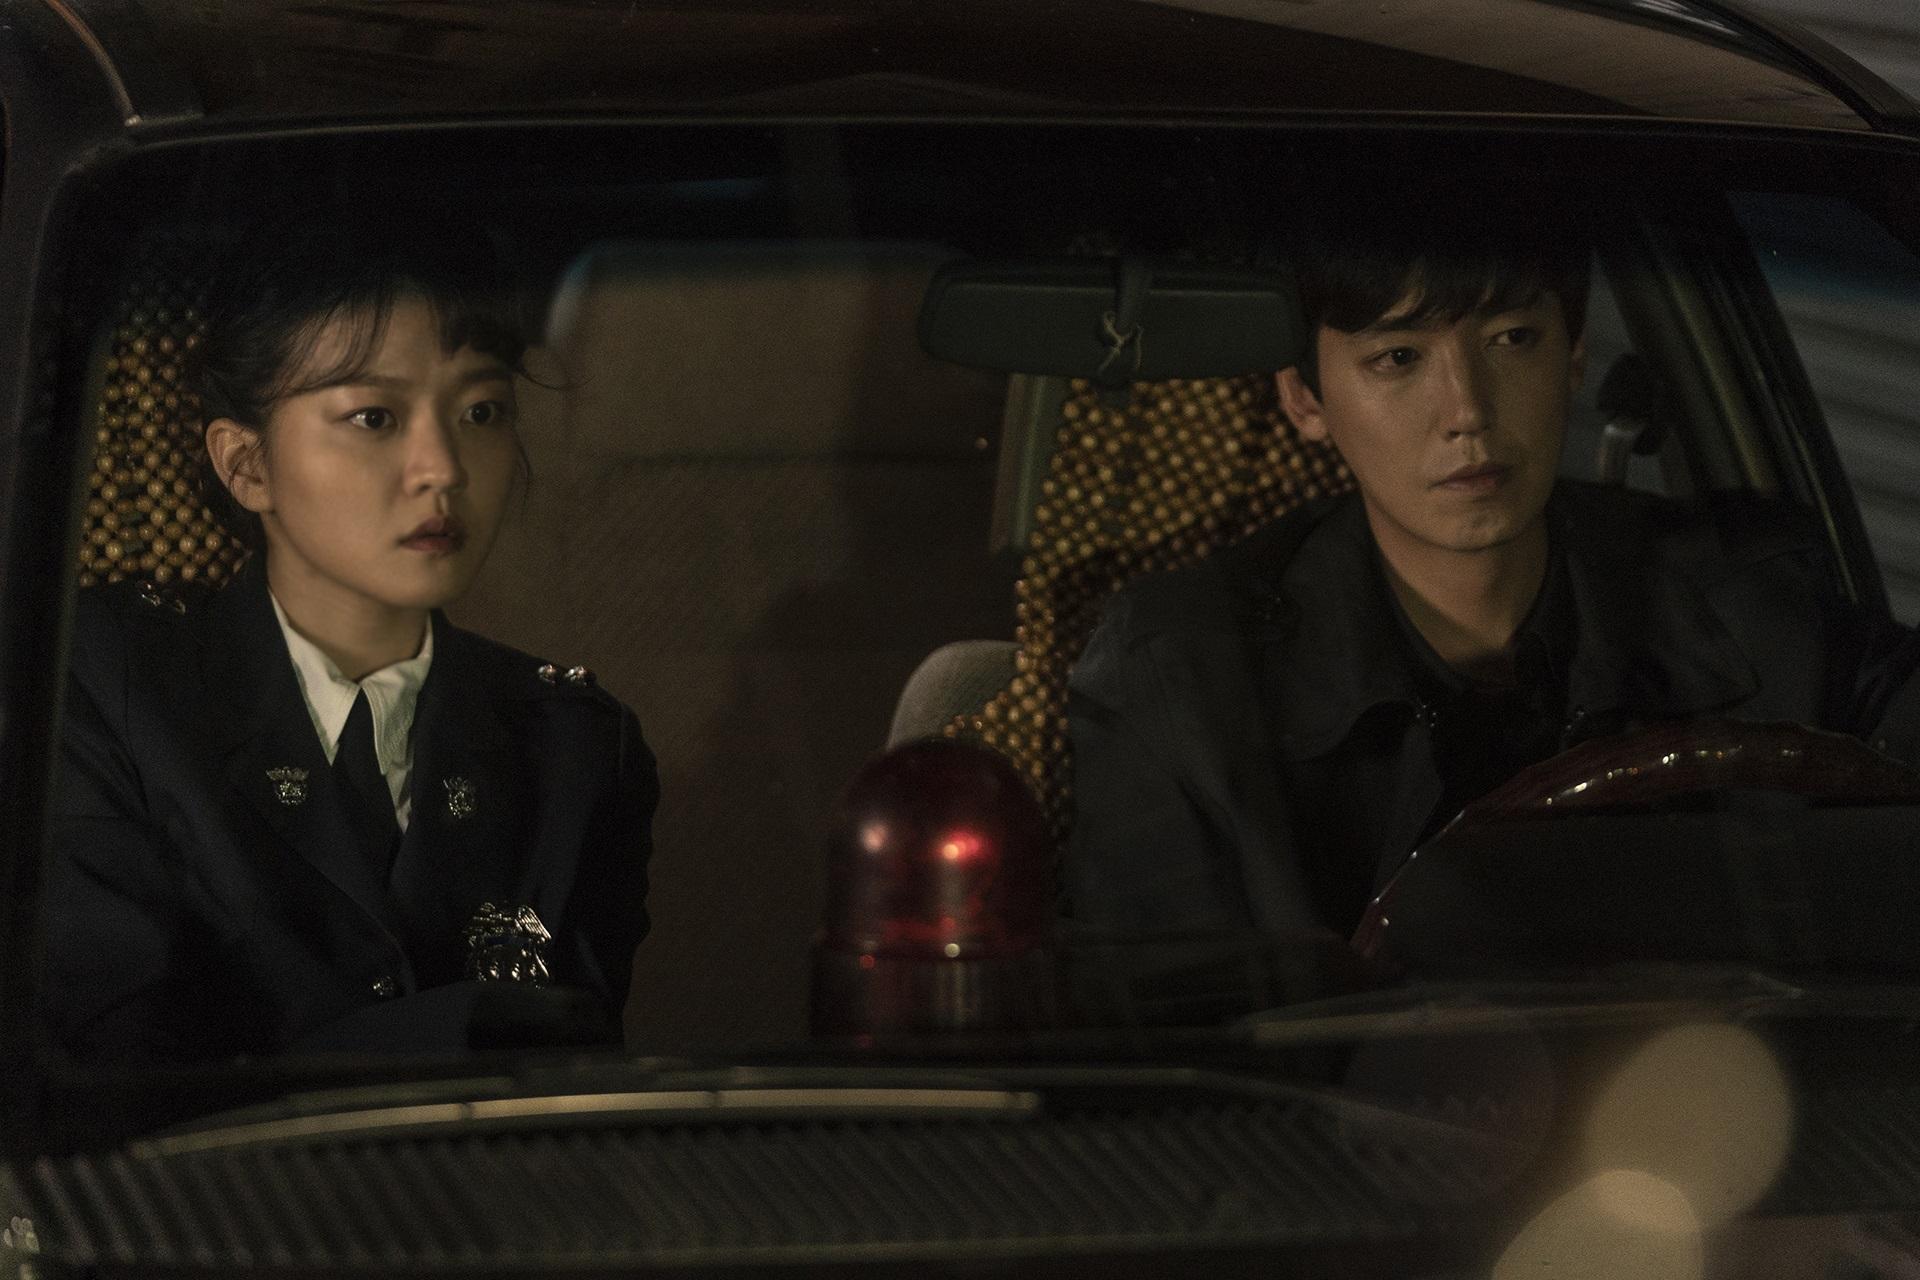 「Miss尹」面對第一個會尊重她的泰柱,似乎有點動心。